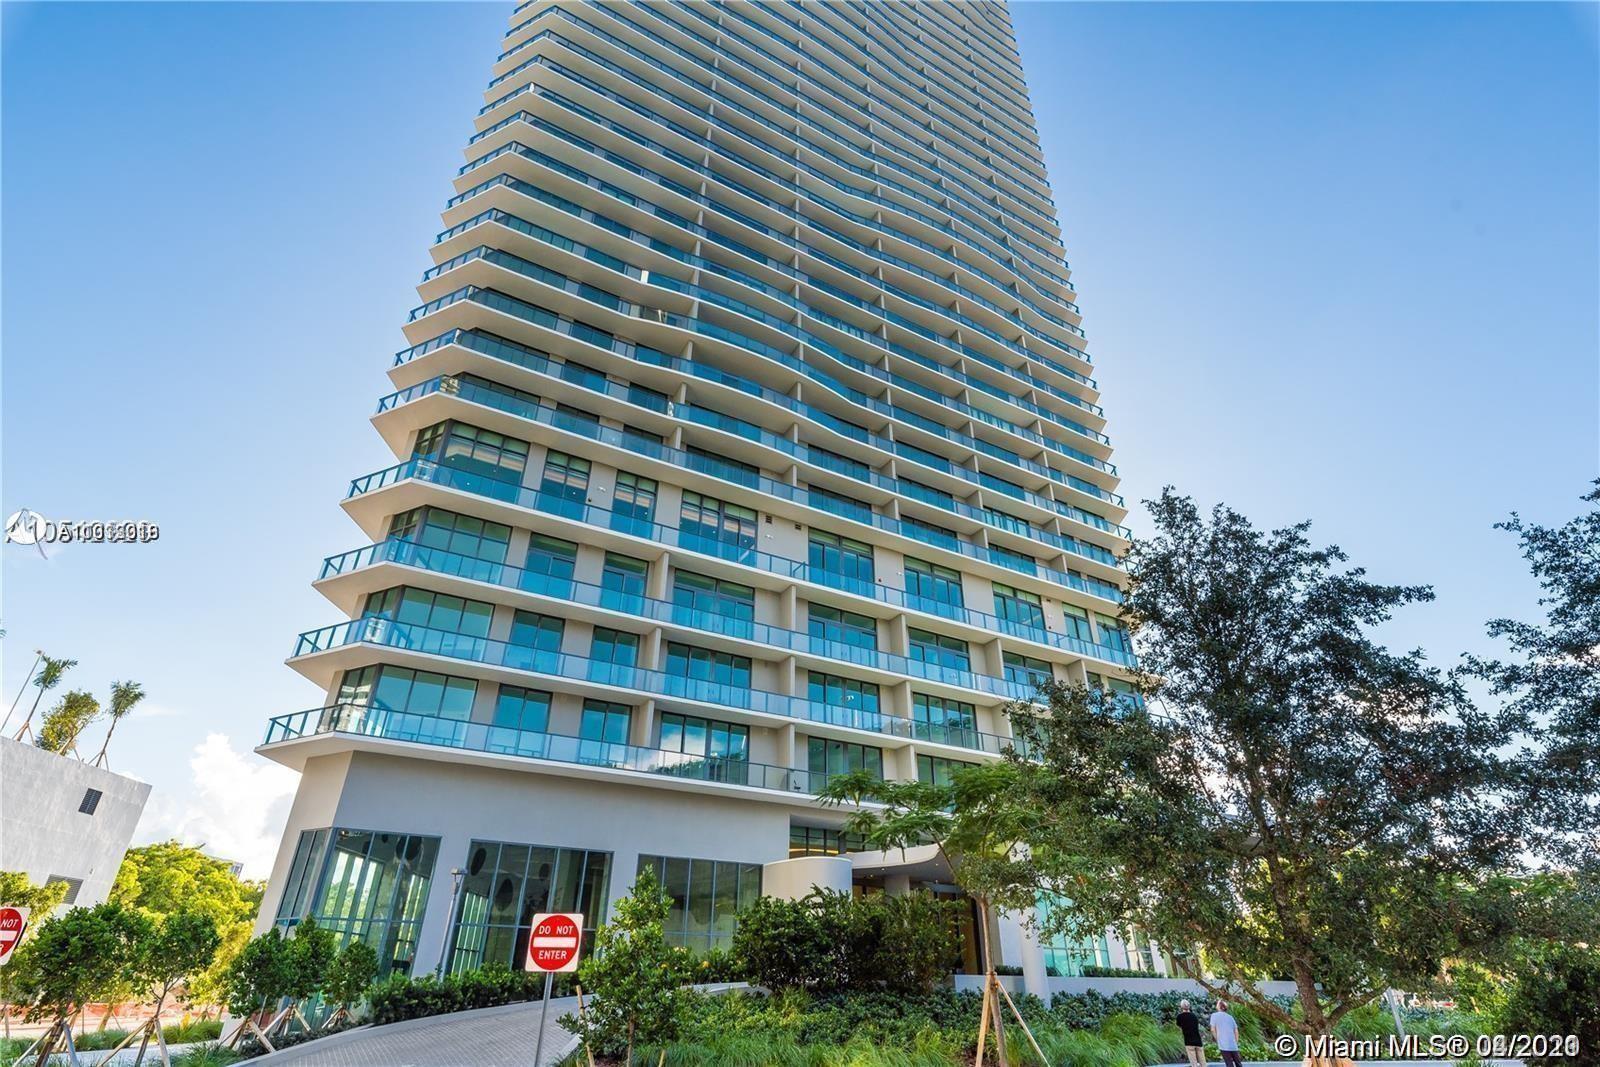 Paraiso Bayviews #1204 - 501 NE 31st St #1204, Miami, FL 33137